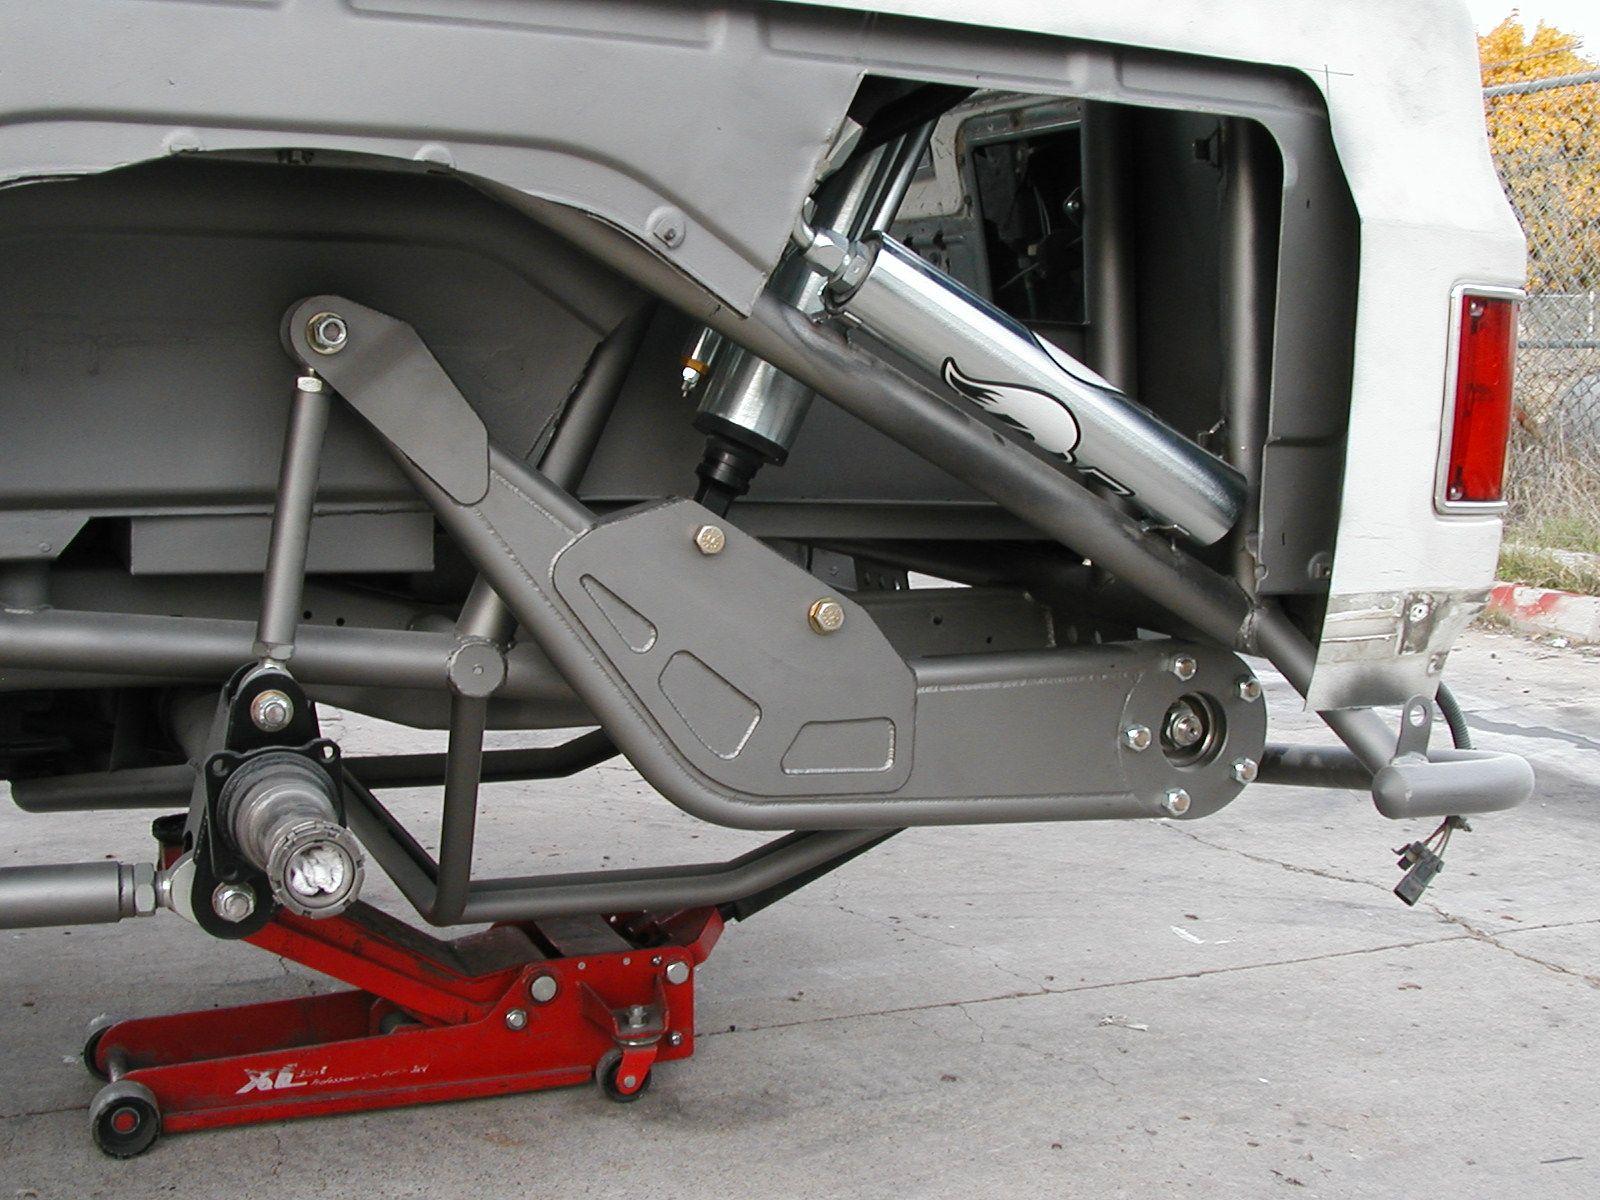 cantilever suspension concept cars pinterest suspension voitures et m canique. Black Bedroom Furniture Sets. Home Design Ideas